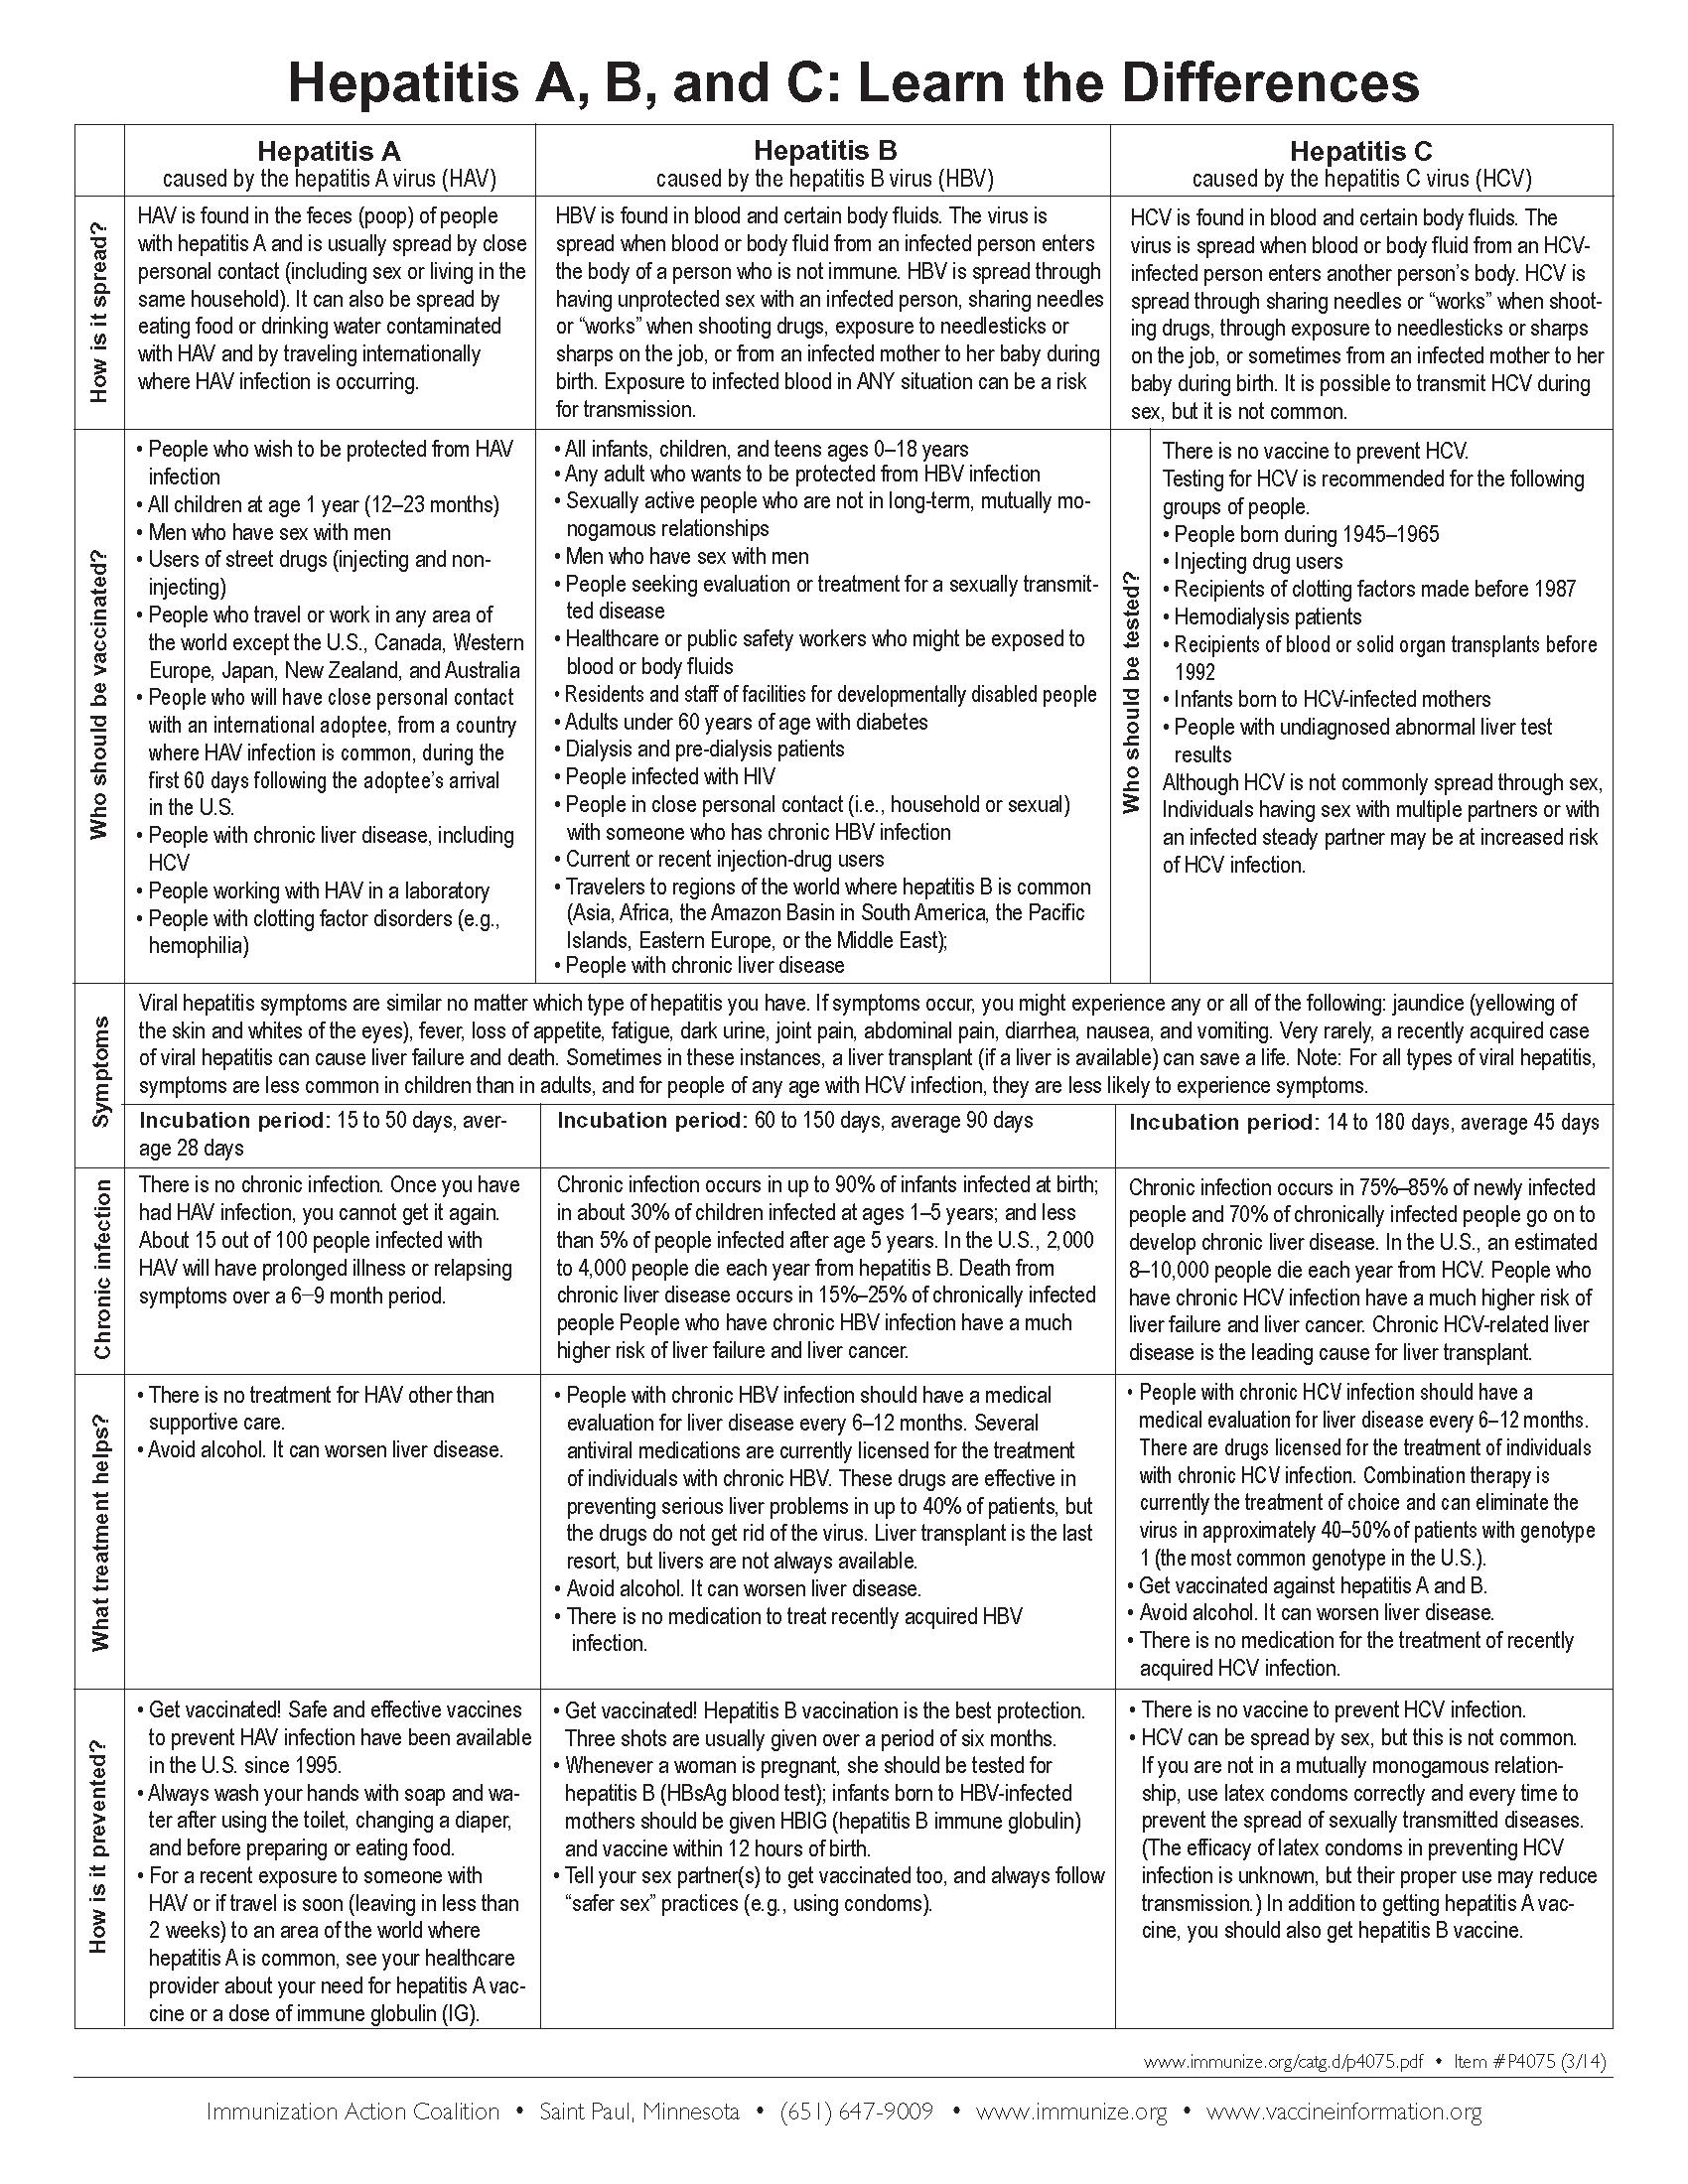 Hepatitis - Symptoms, Treatment, and More